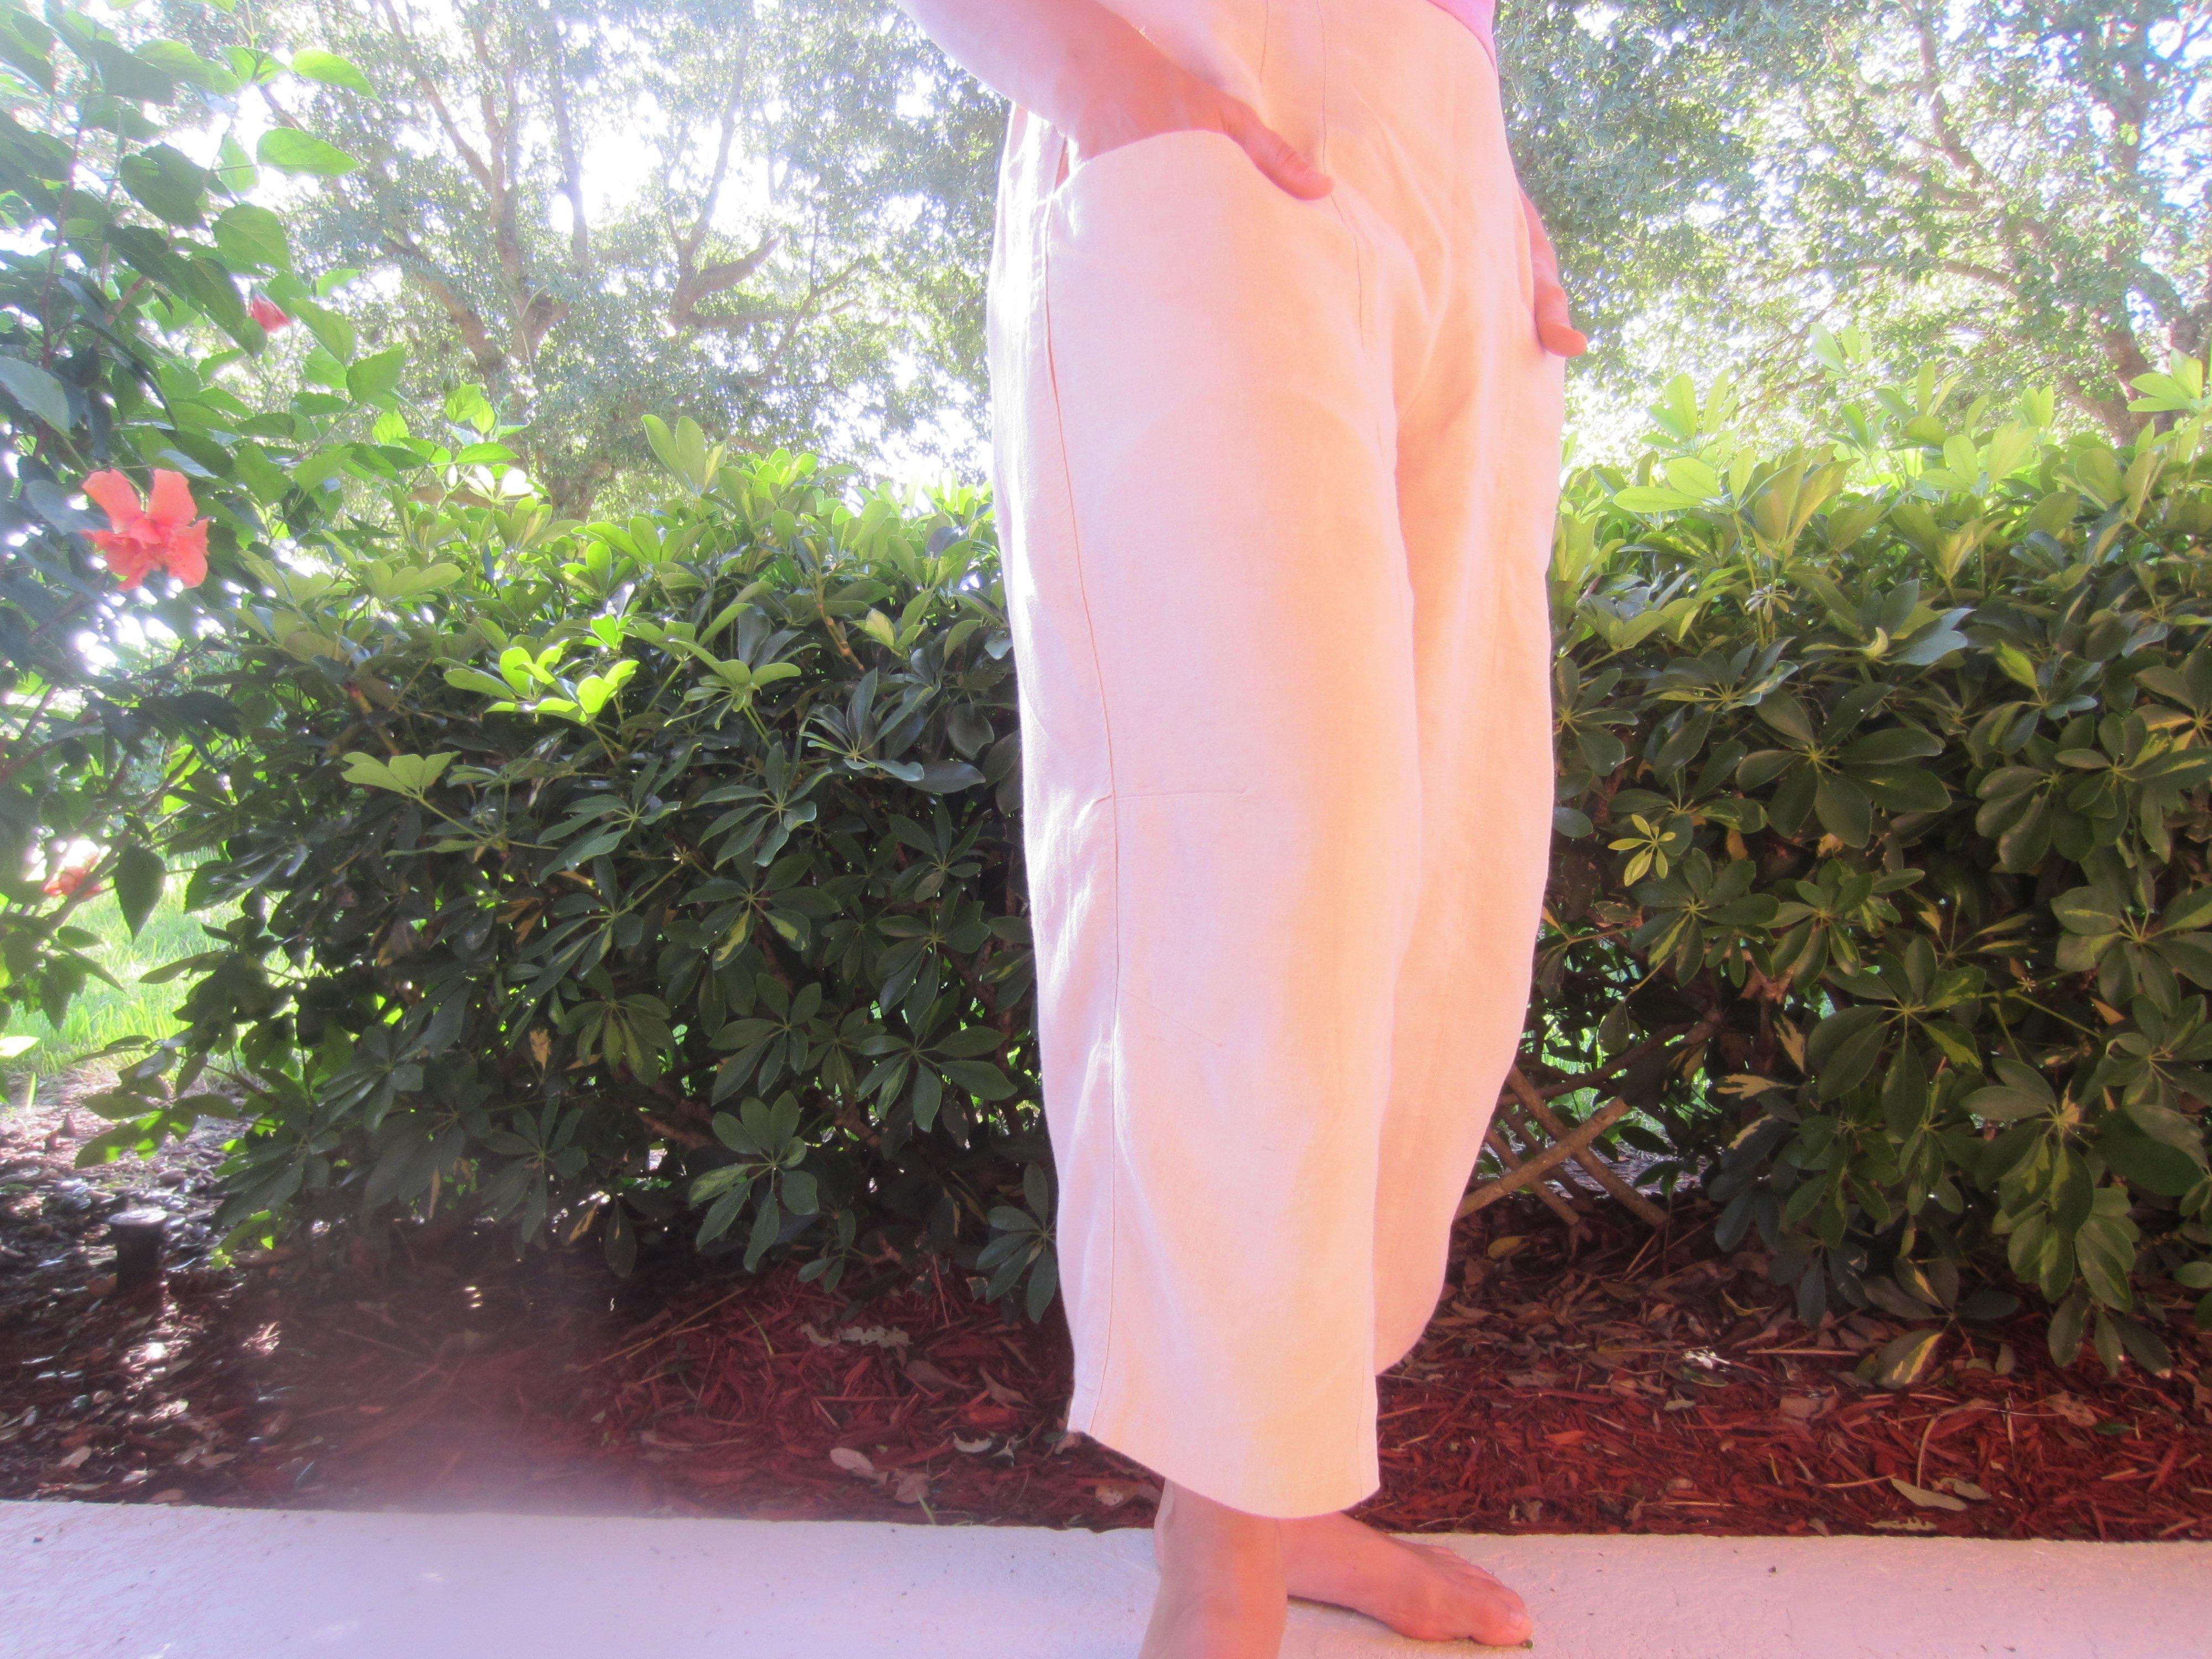 Marcy Tilton Pants, V8499, Avocado dyed hemp tencel twill